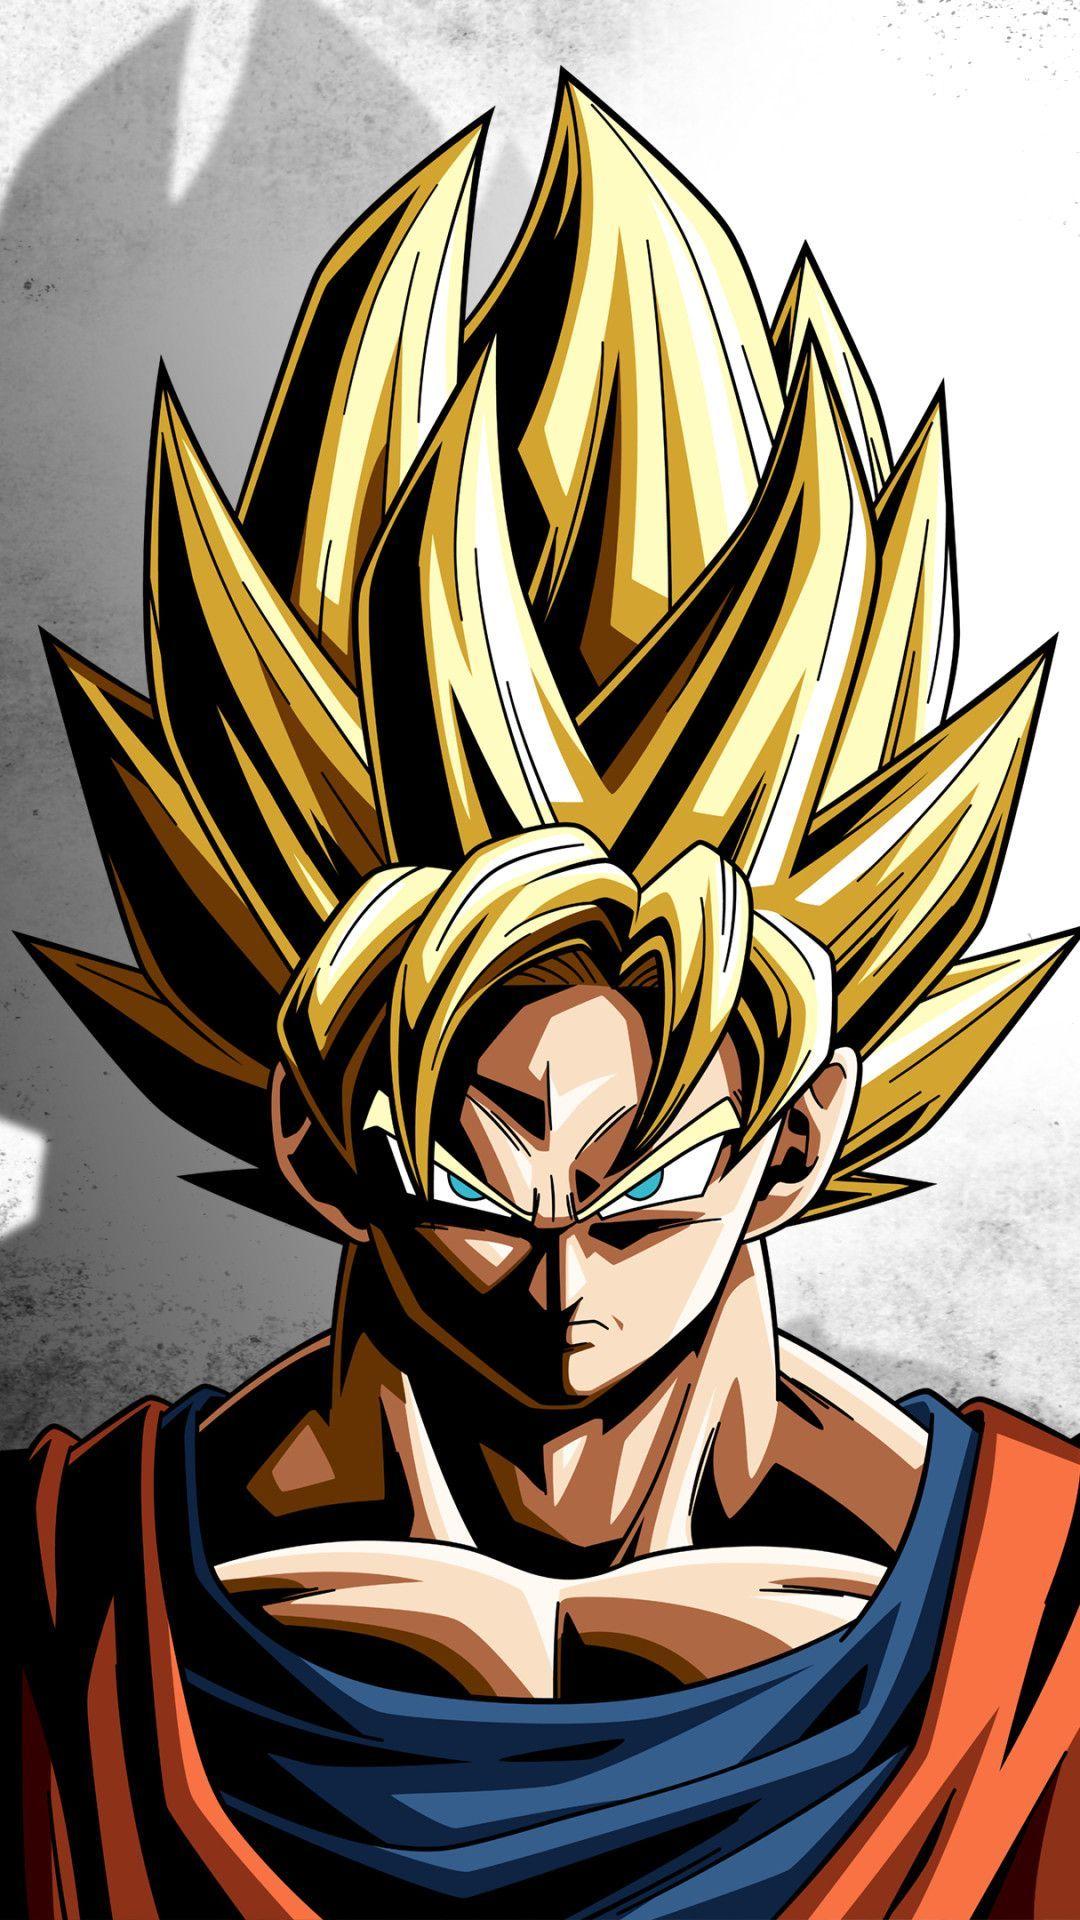 List of Easy Anime Wallpaper IPhone 7 Plus 1080x1920